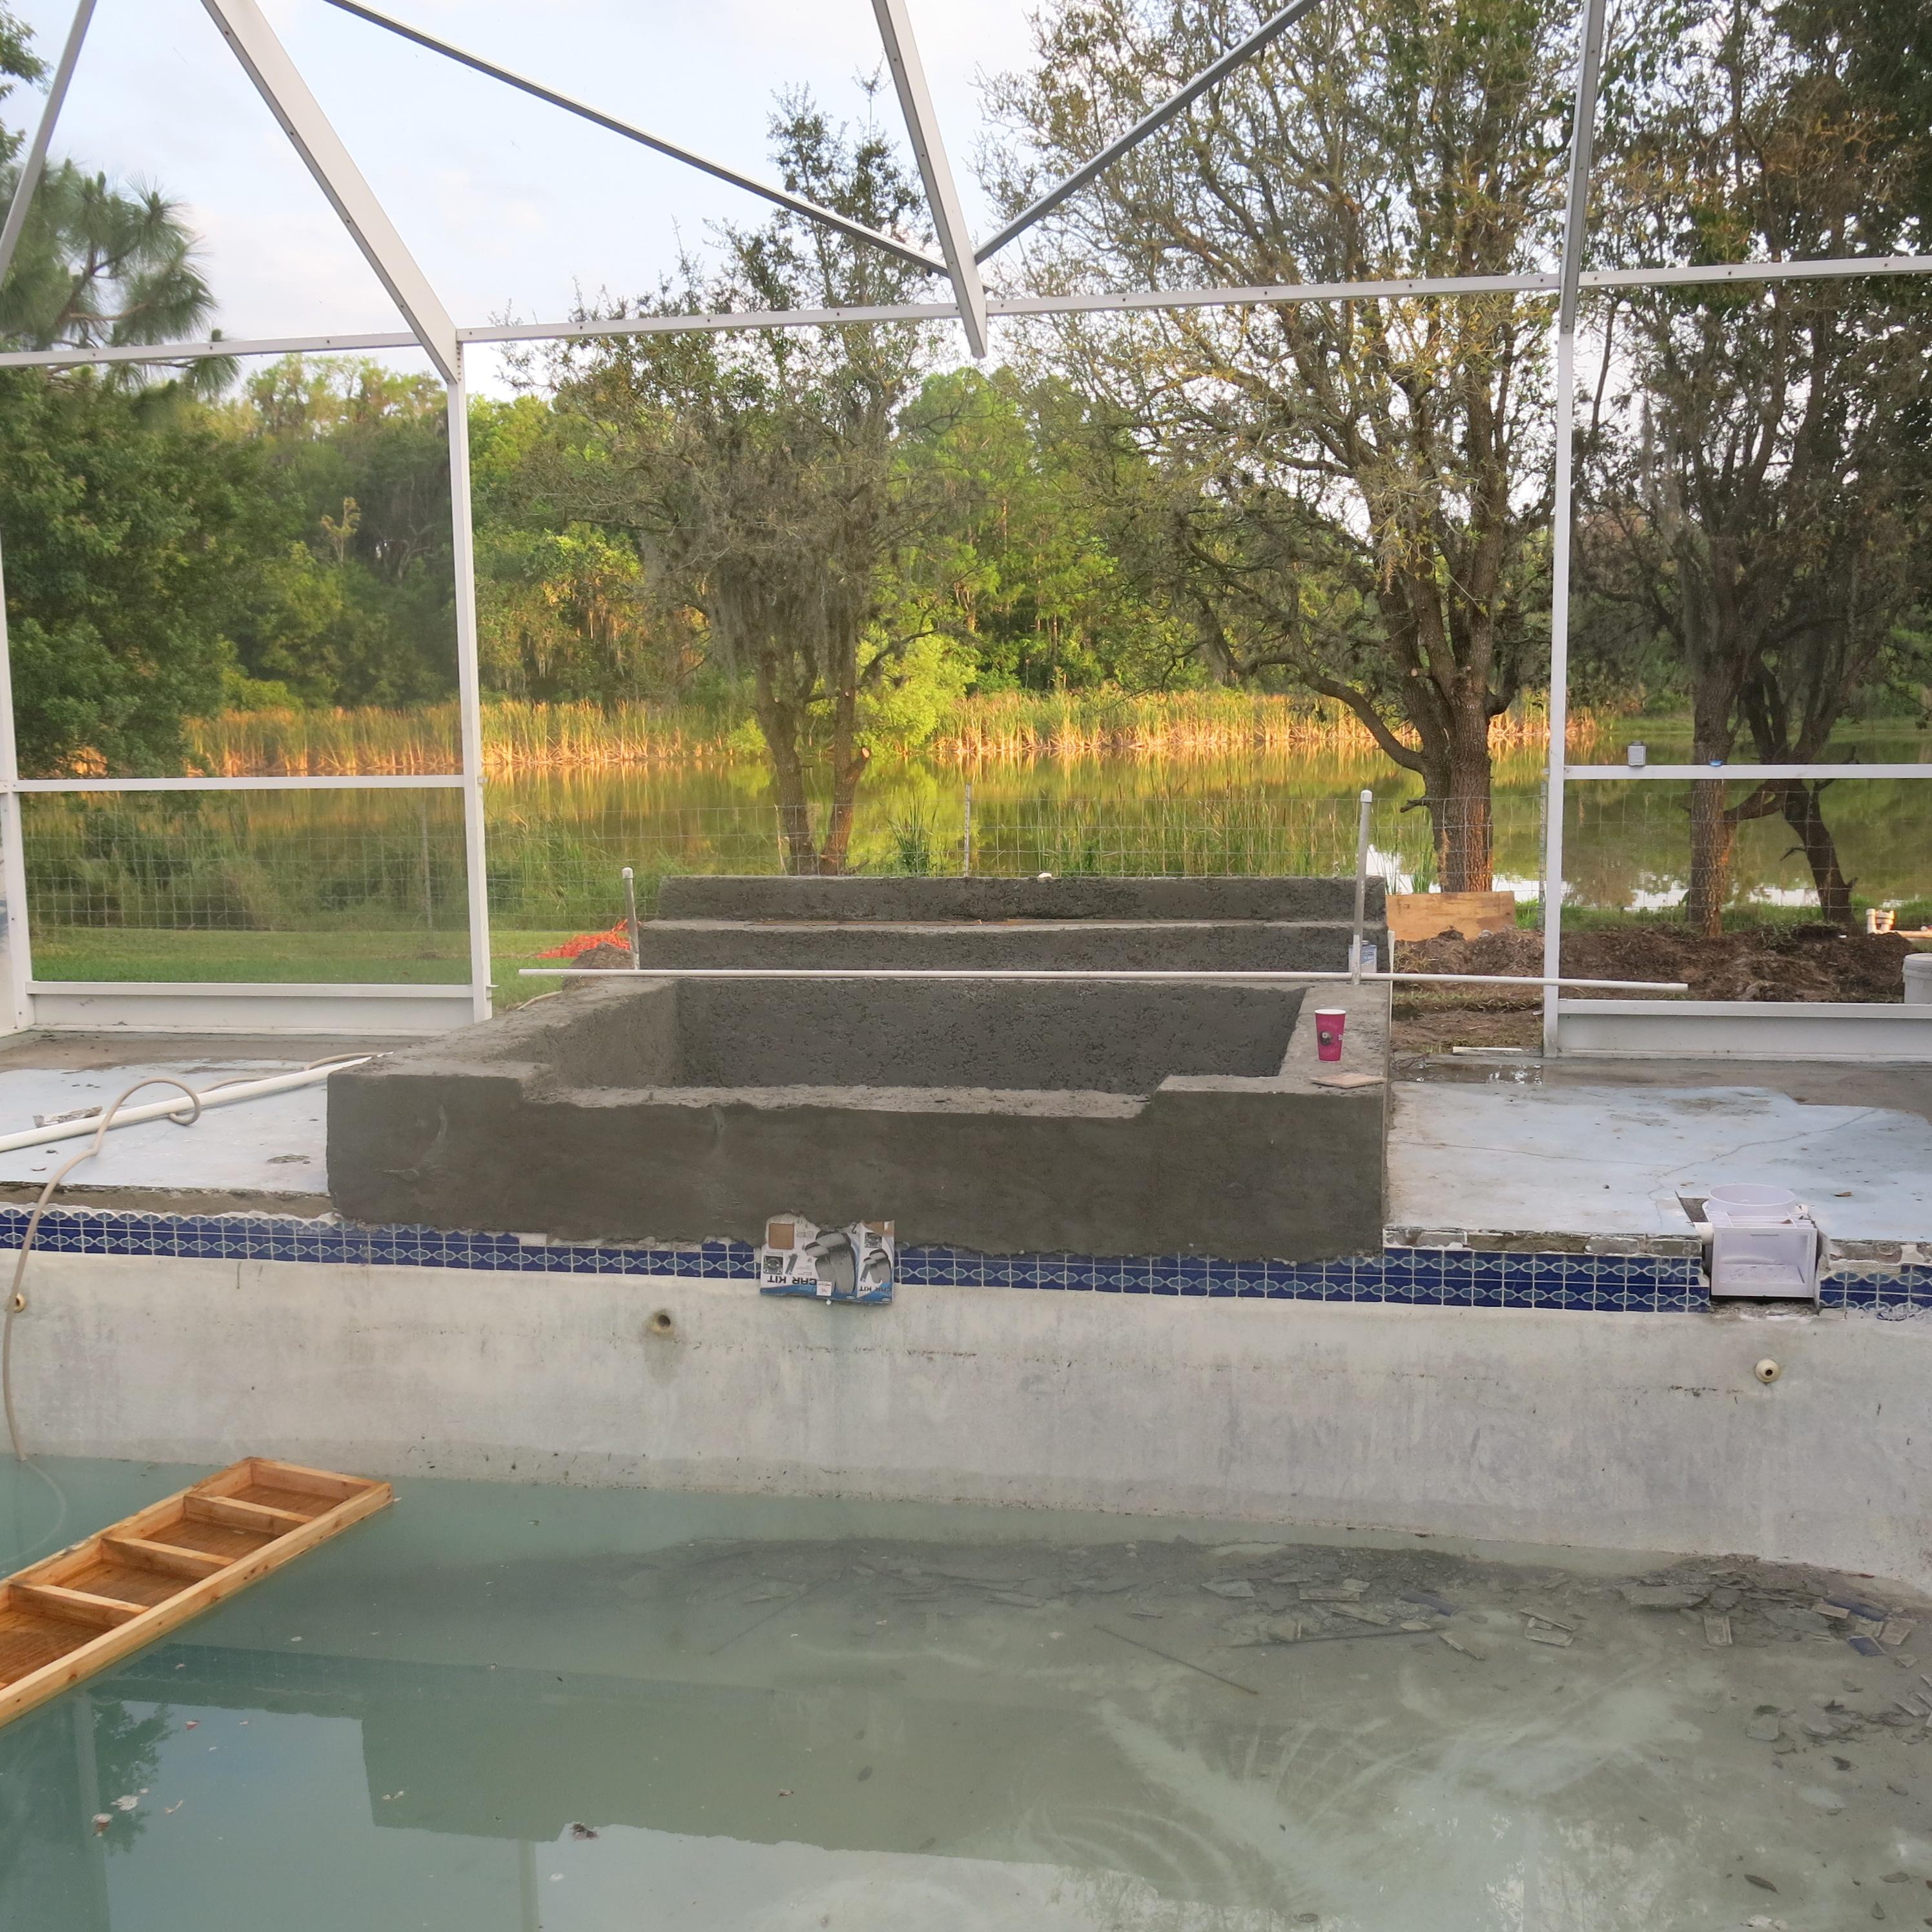 Splash Swimming Pools: Big Splash Pools Builds Swimming Pools For Tampa Bay Area